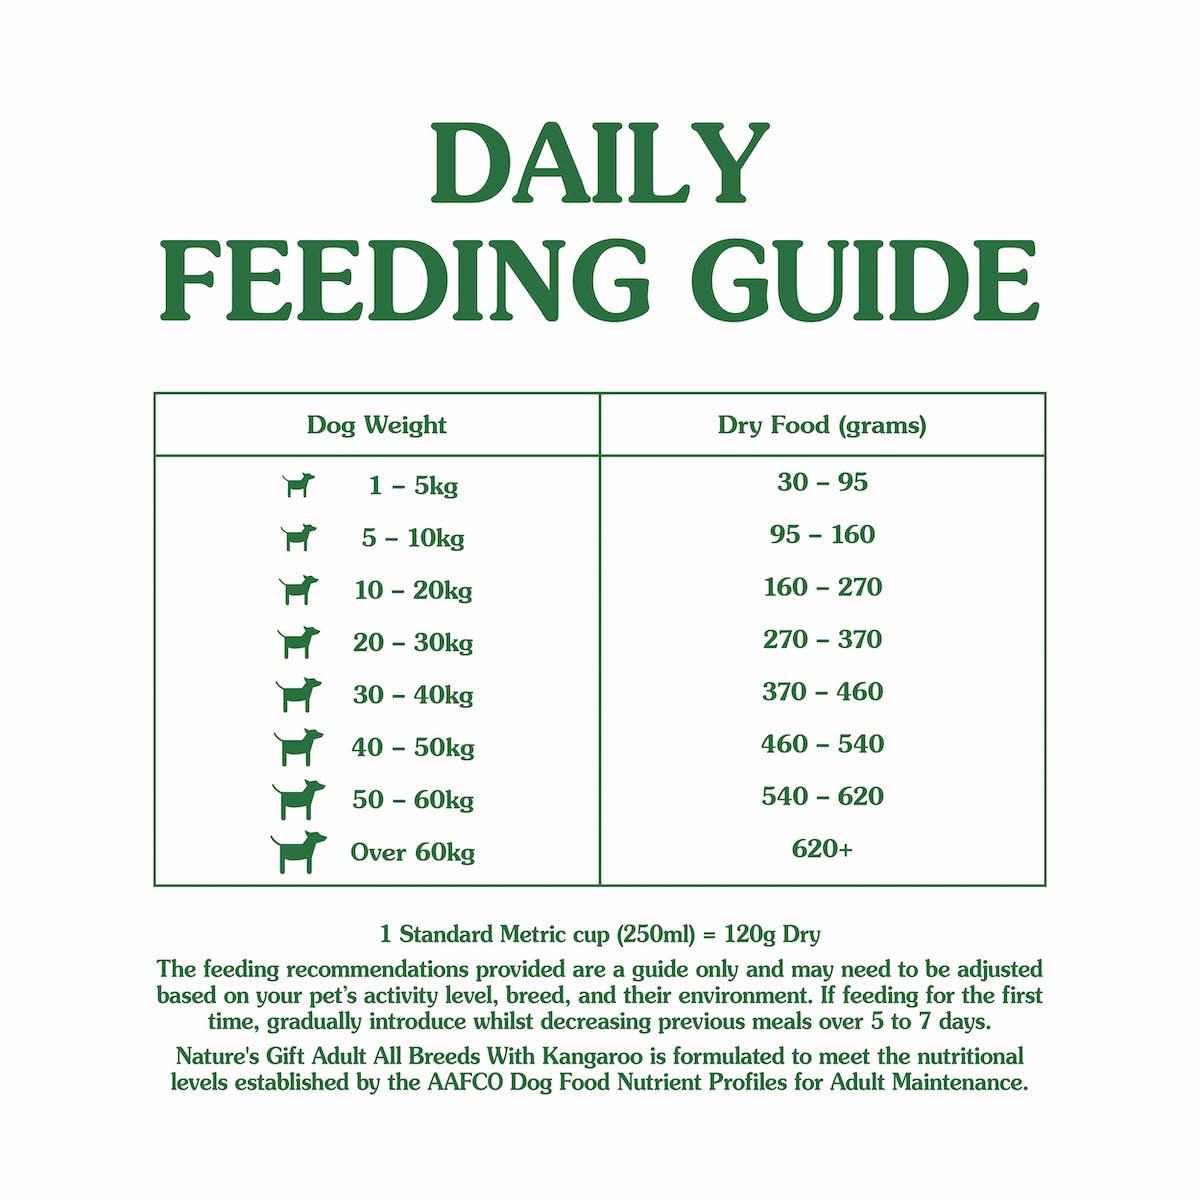 Nature's Gift | Kangaroo | Dry dog food